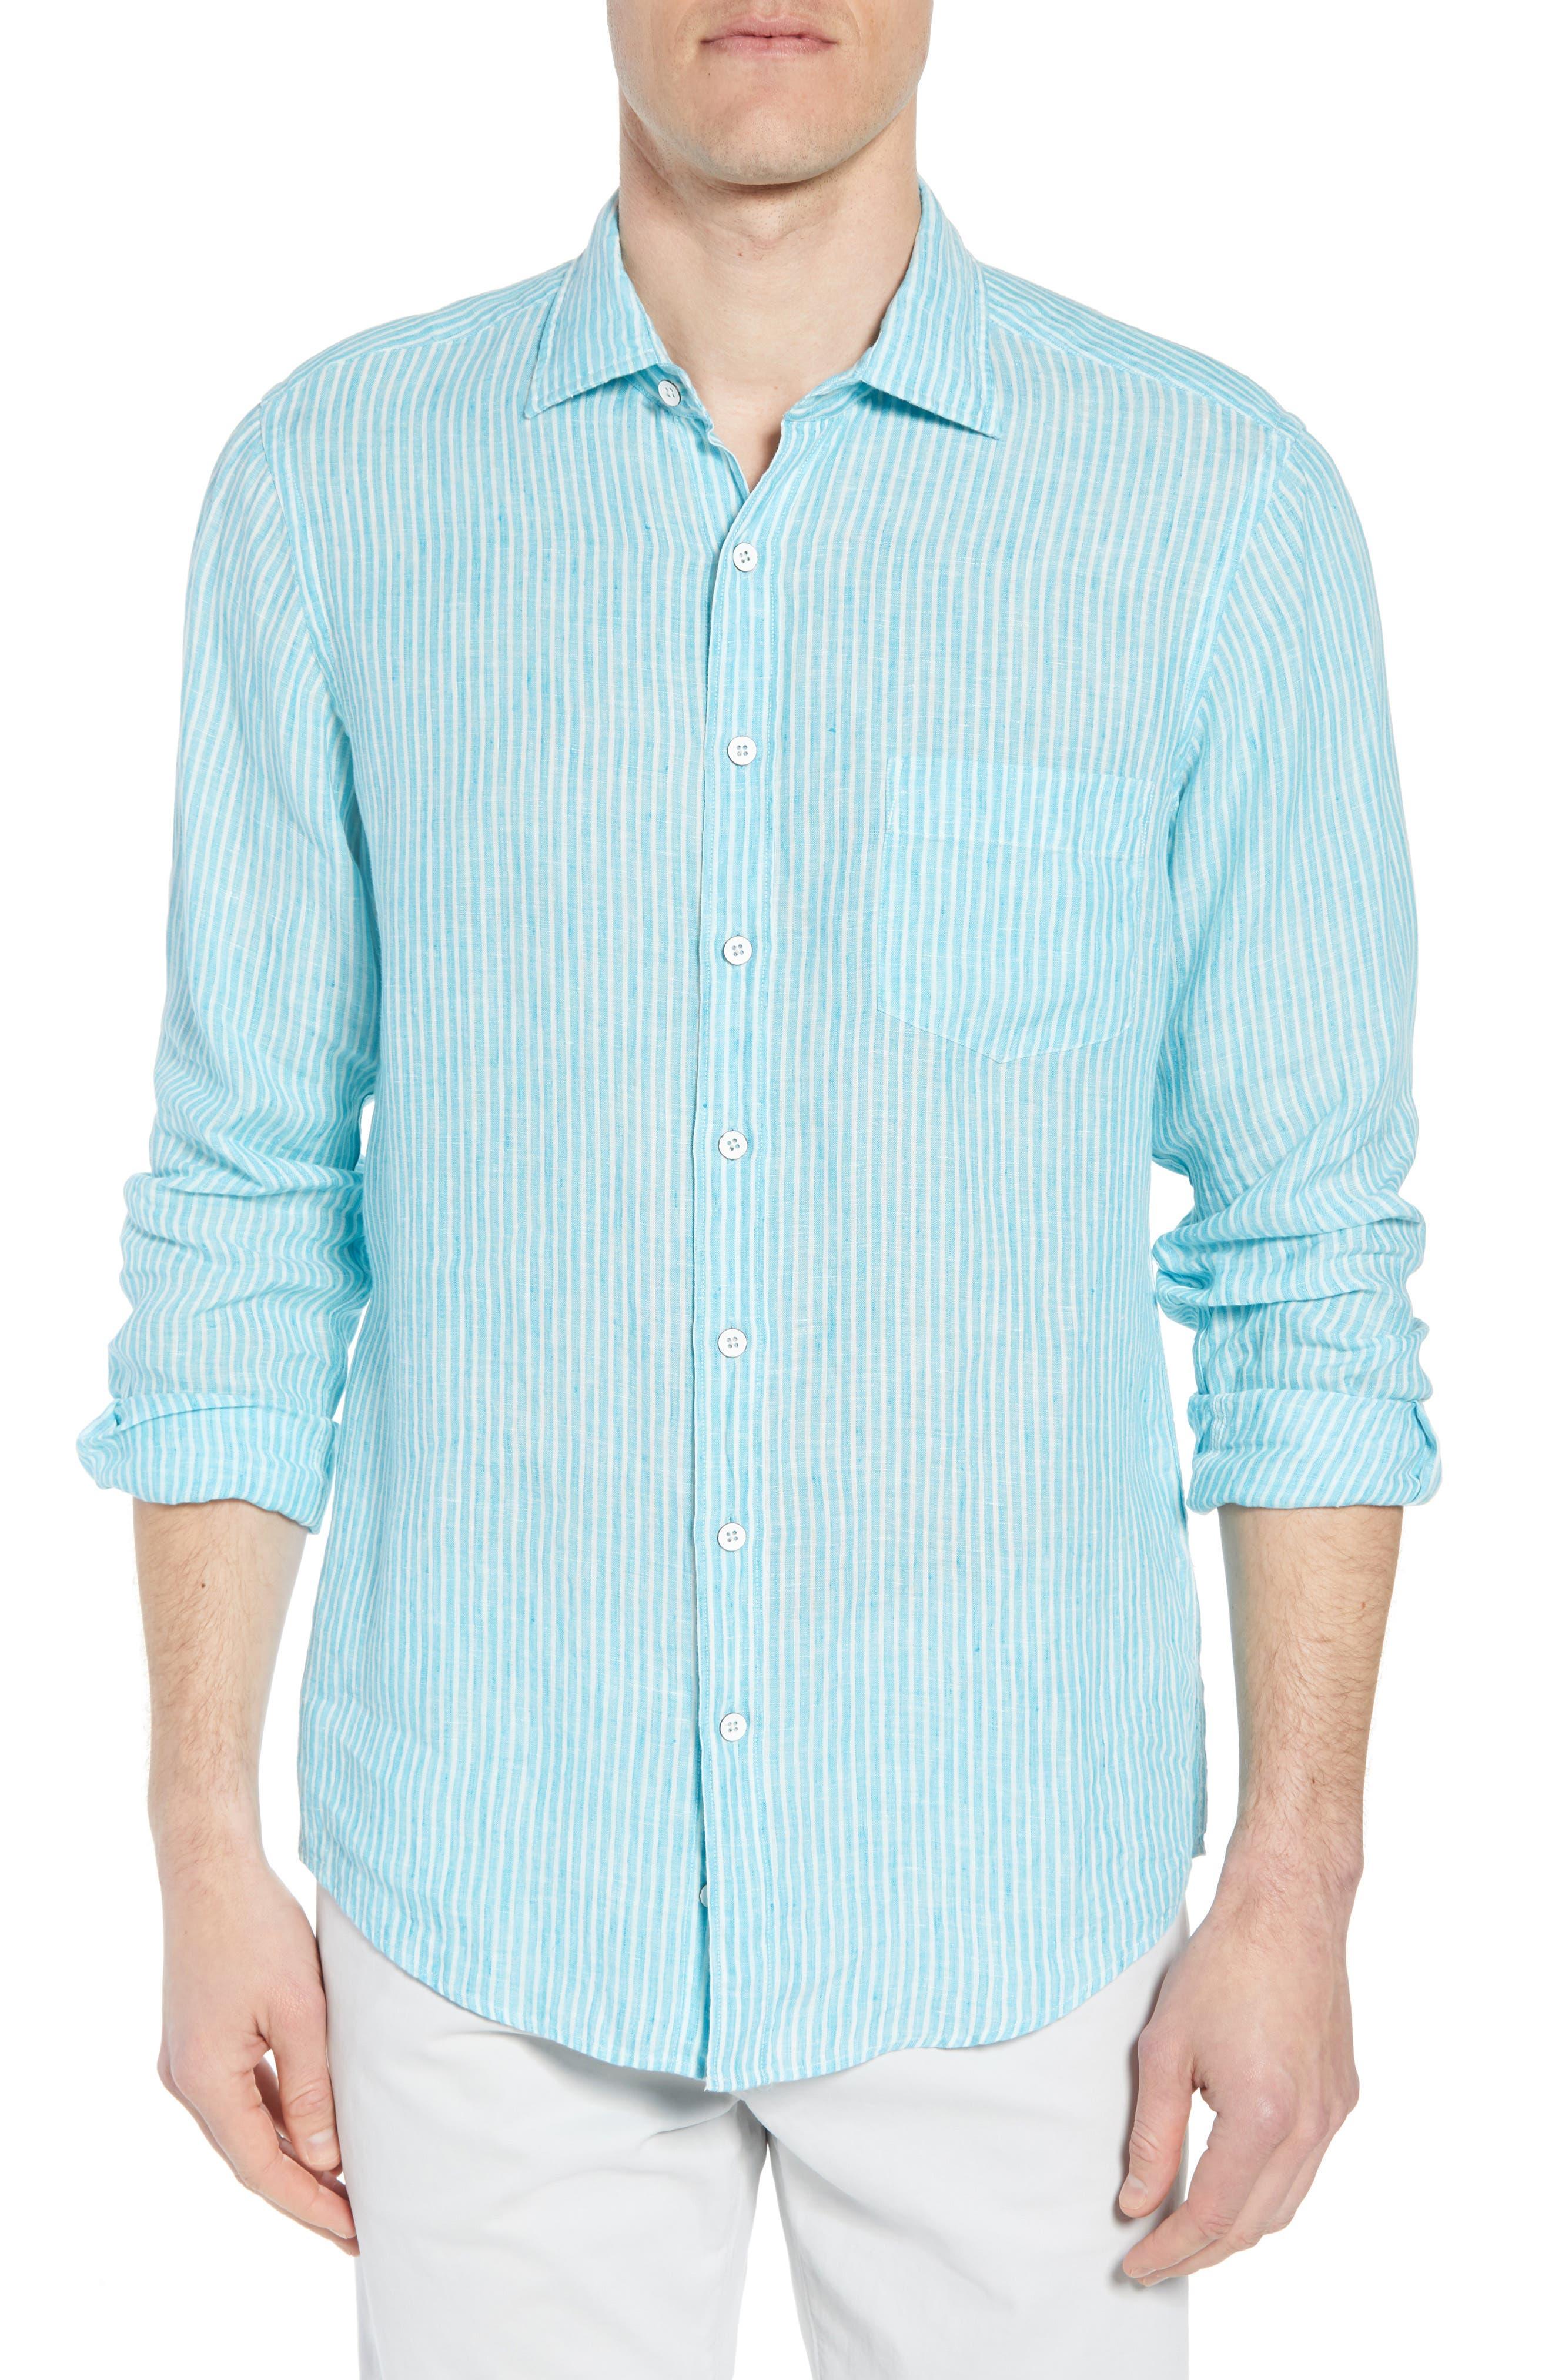 Warwick Junction Stripe Linen Sport Shirt,                             Main thumbnail 1, color,                             TEAL